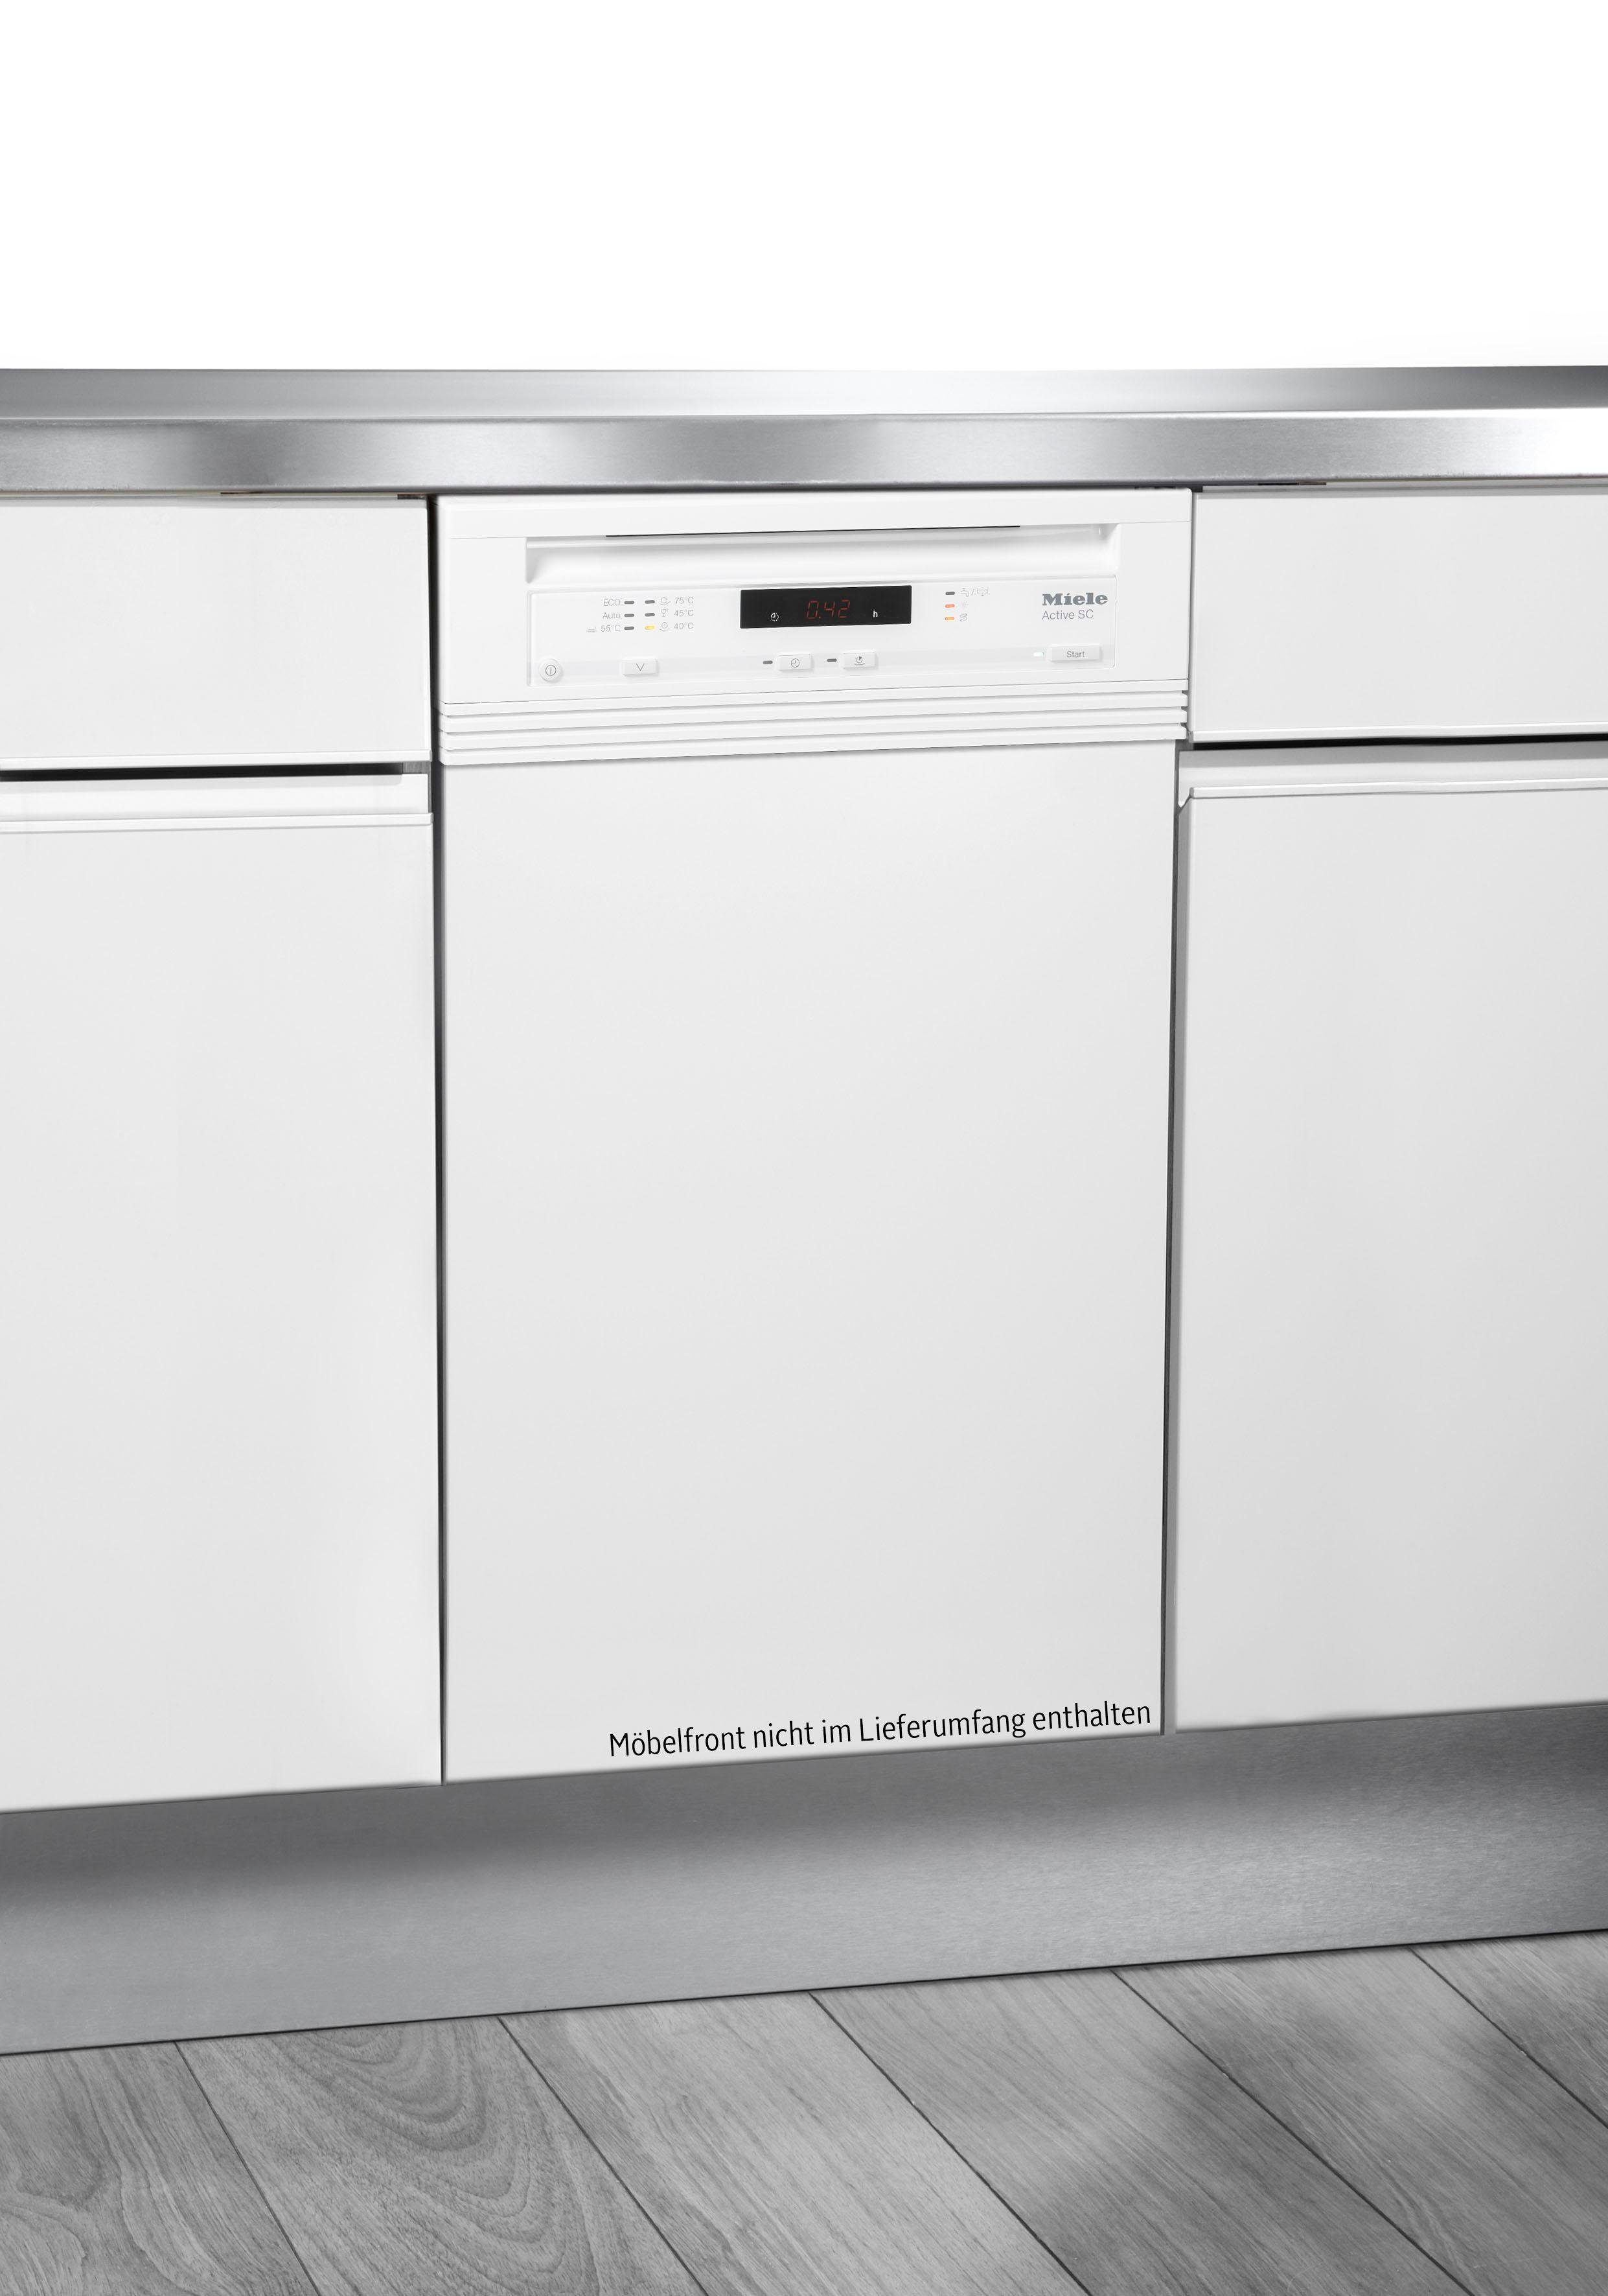 Miele teilintegrierbarer Geschirrspüler, G 4620 SCi brws, 0,87 l, 9 Maßgedecke, 45 cm breit